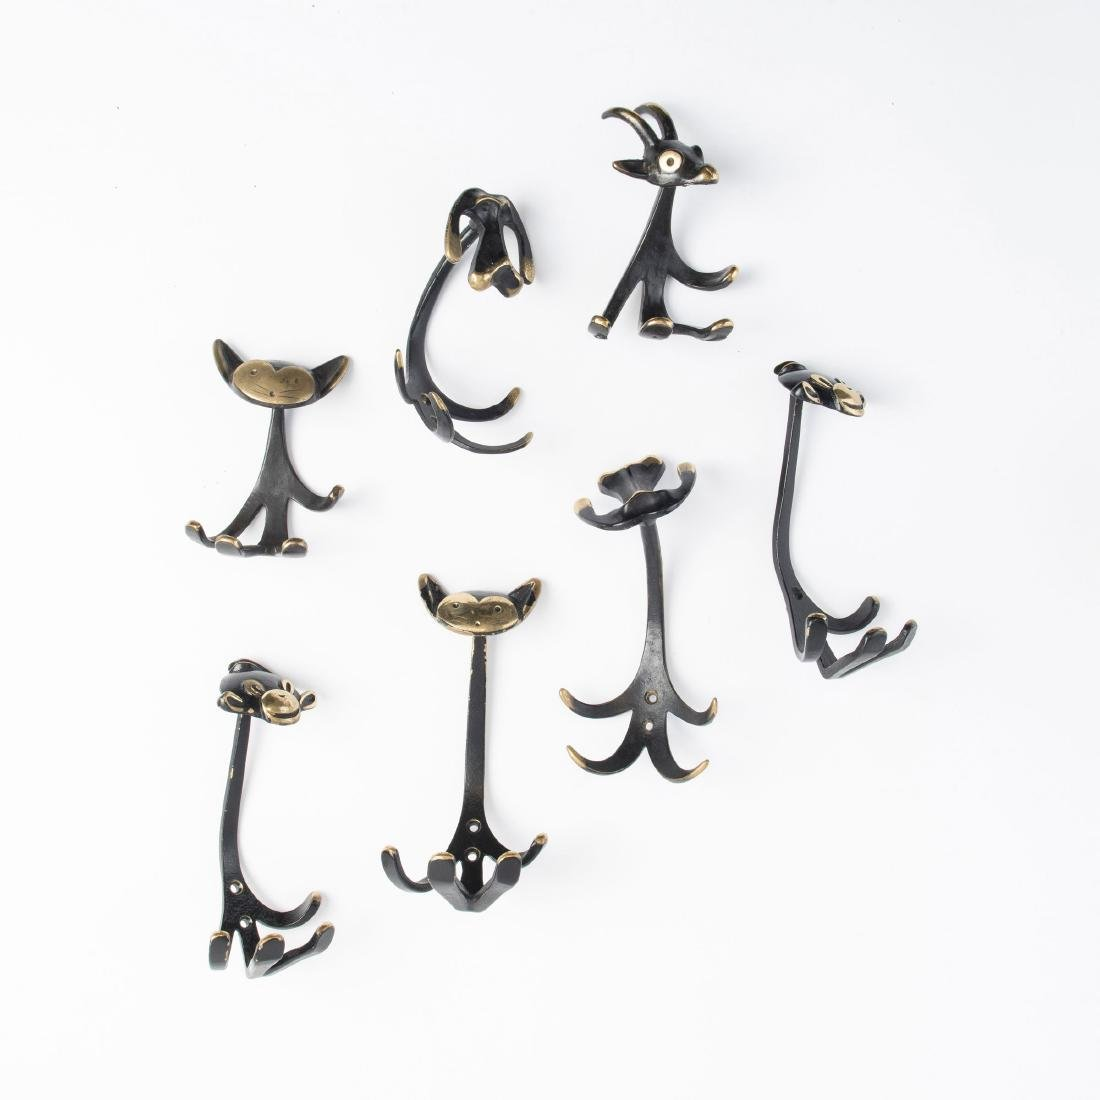 Seven coat hooks, c. 1950 - 2